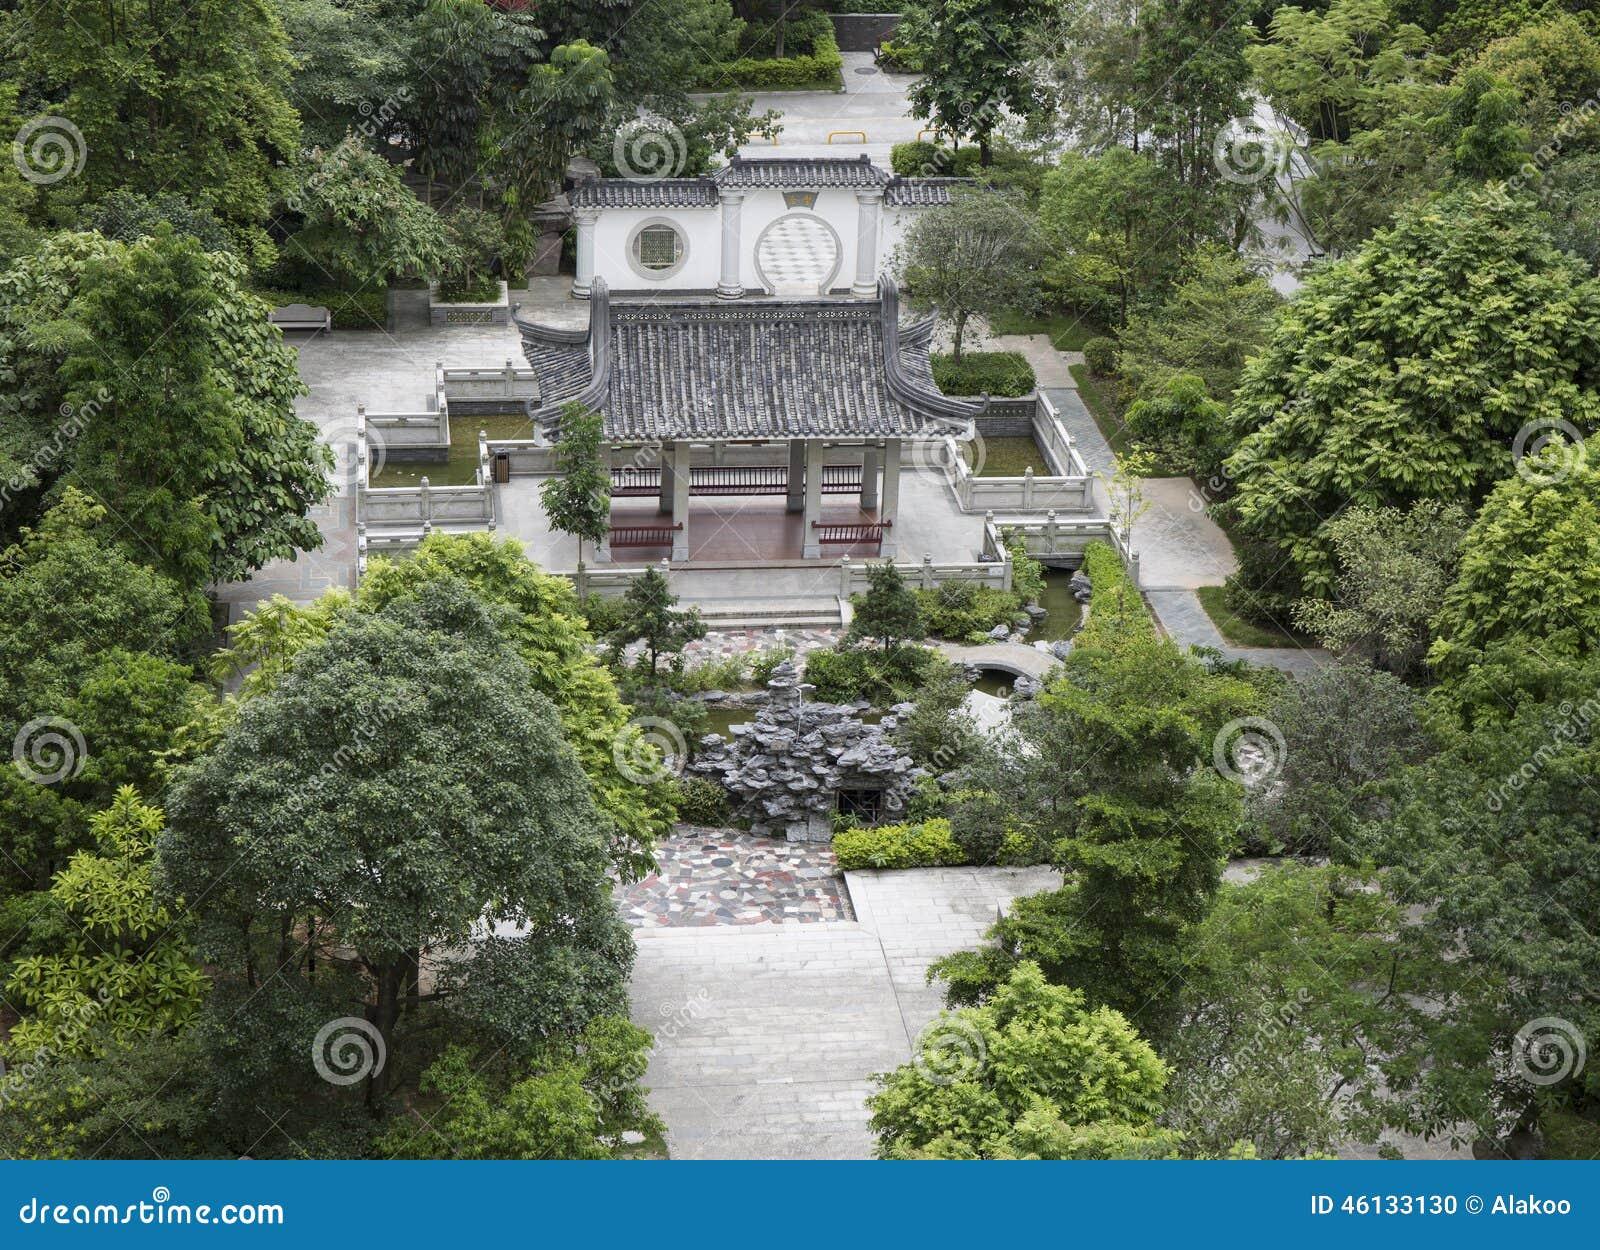 Image Result For Orient Garden